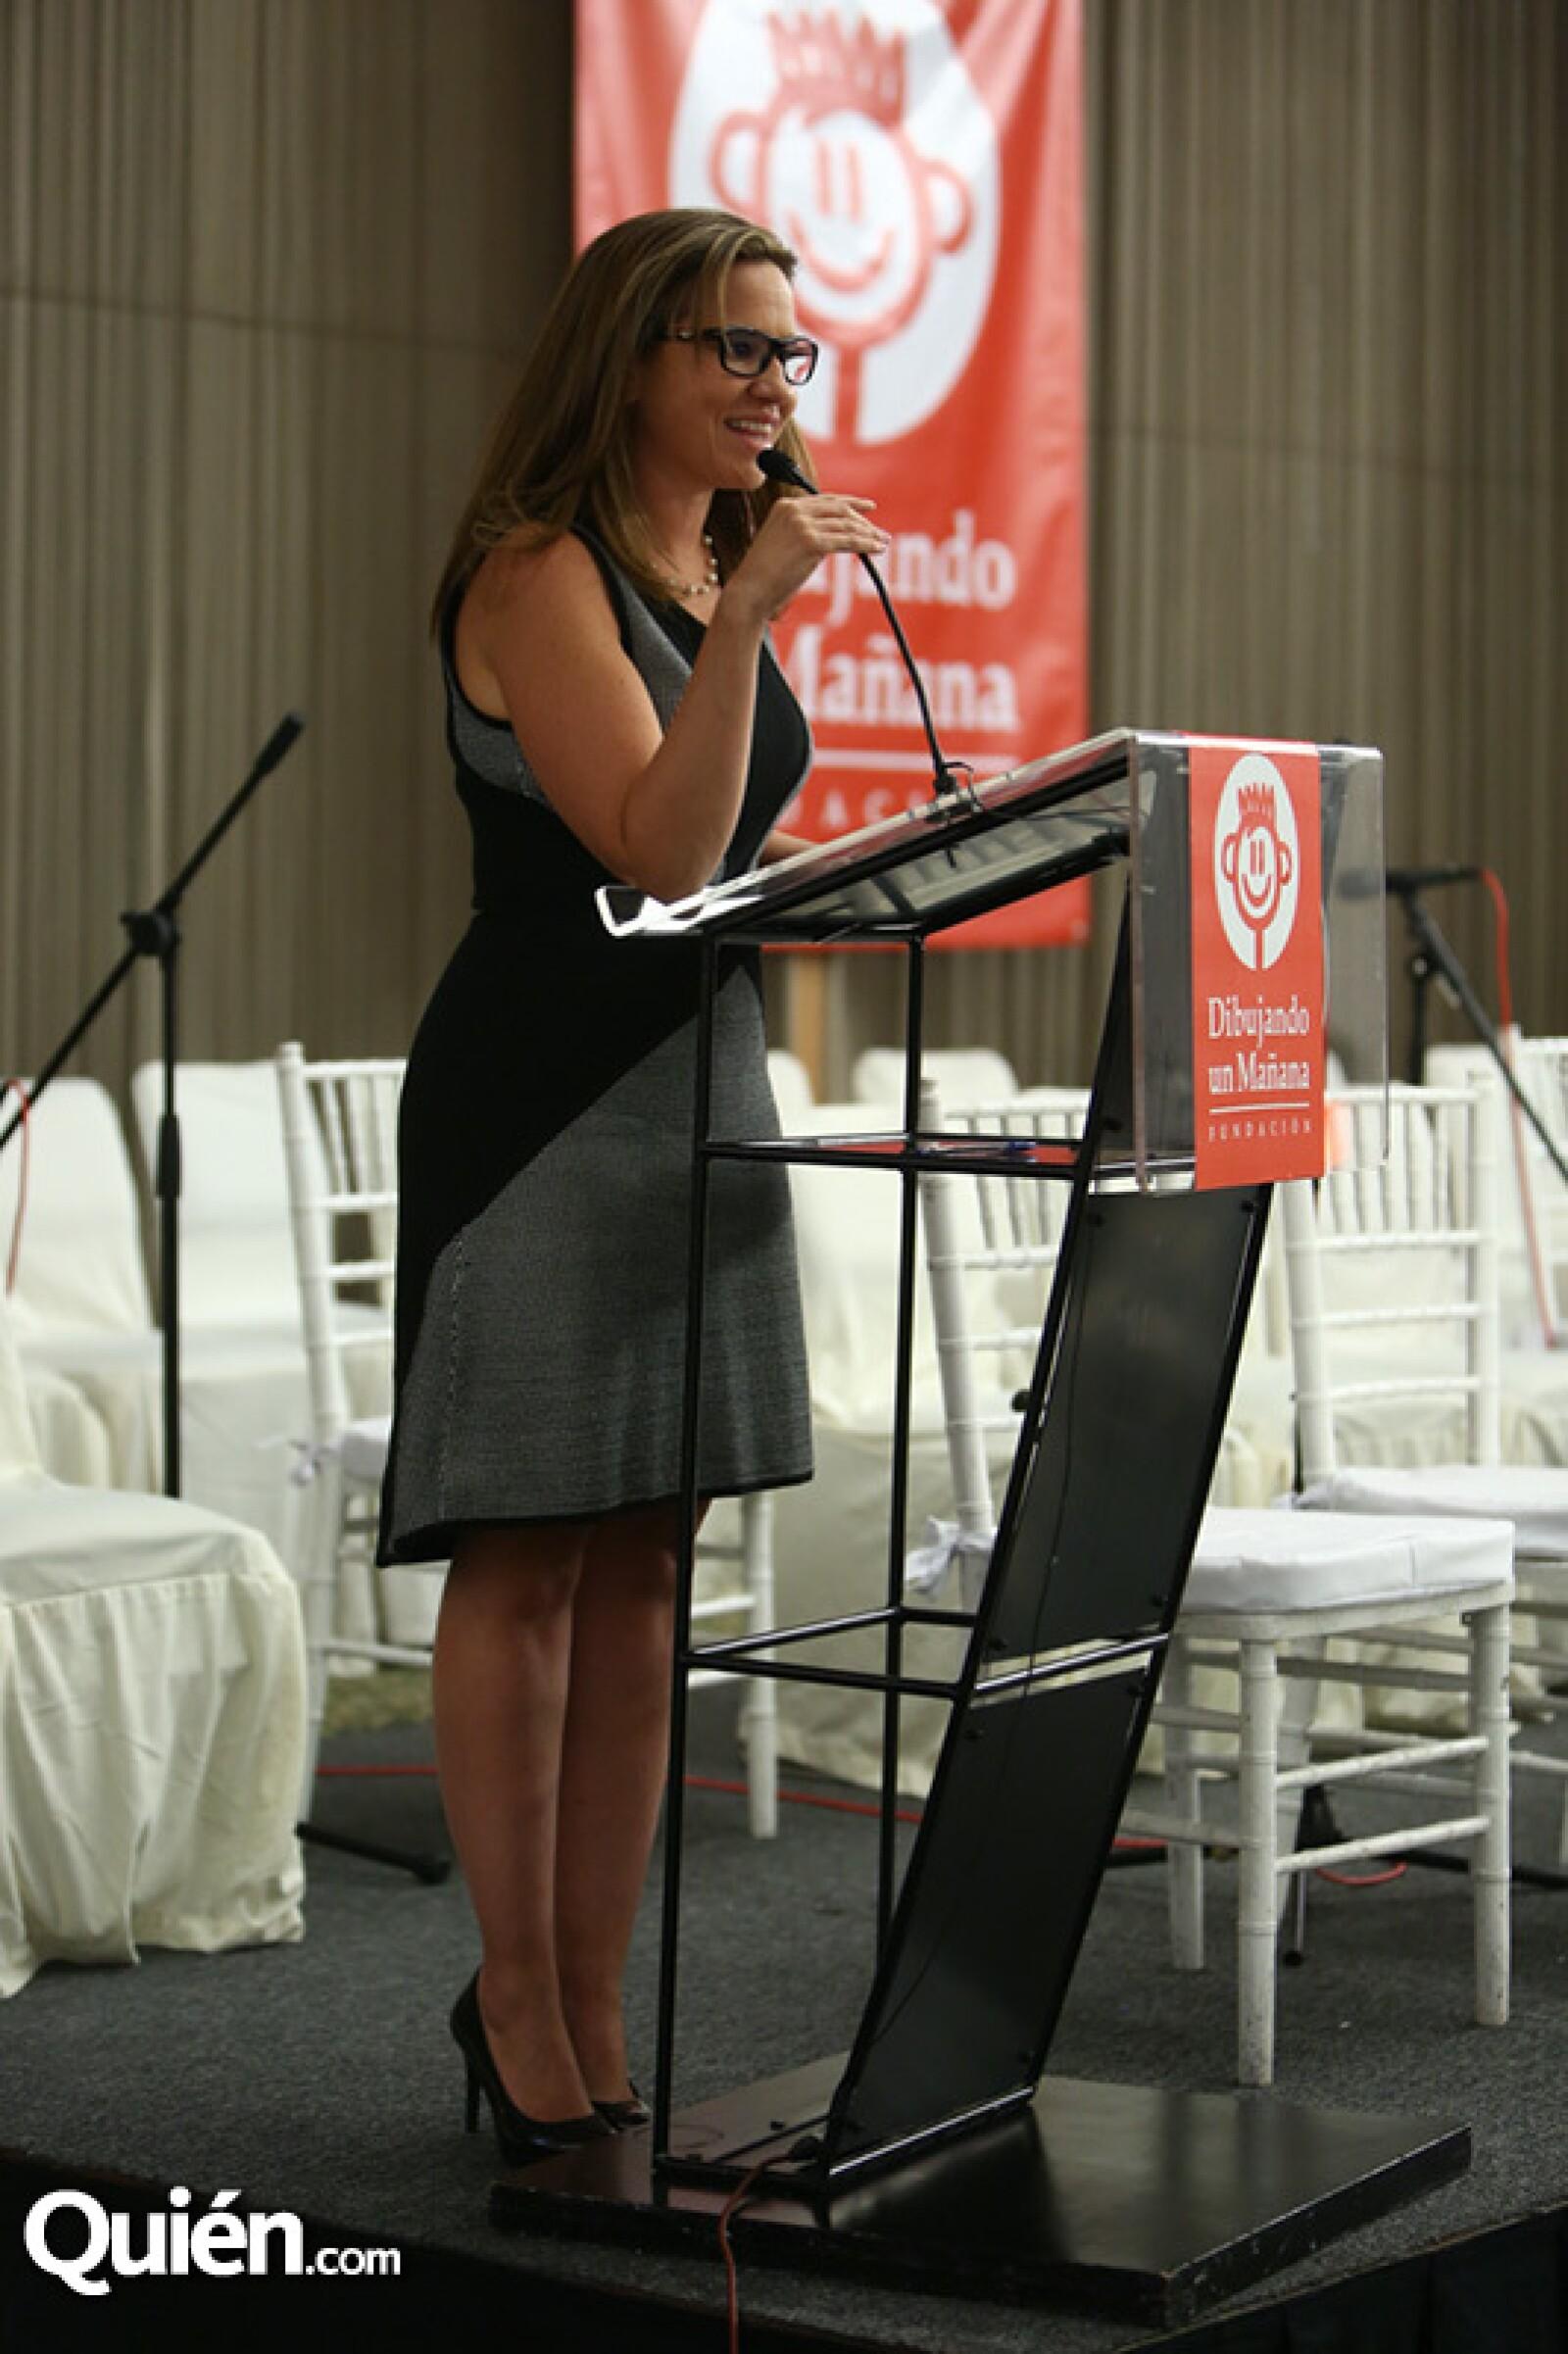 Kathy Beltrán